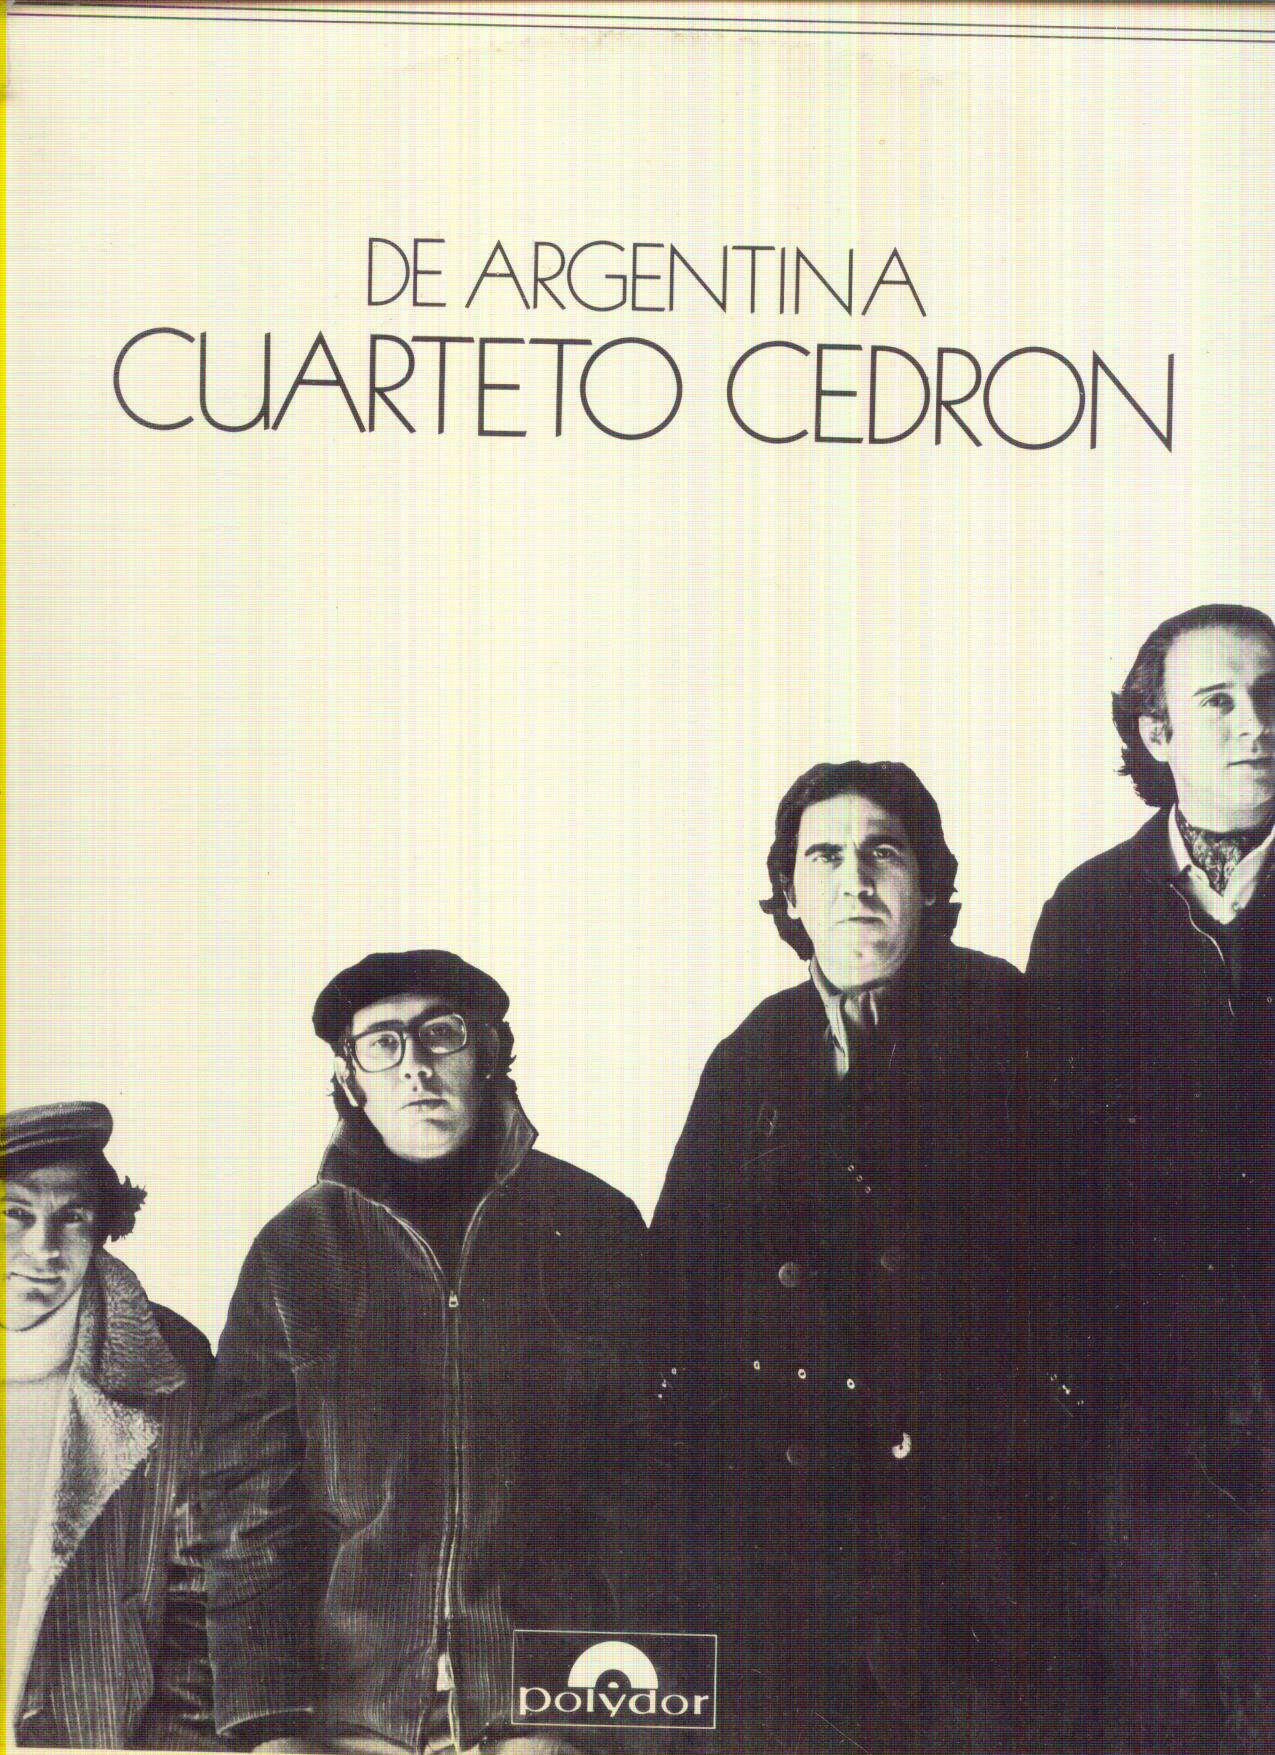 CUARTETO CEDRON CUARTETO CEDRON DE ARGENTINA